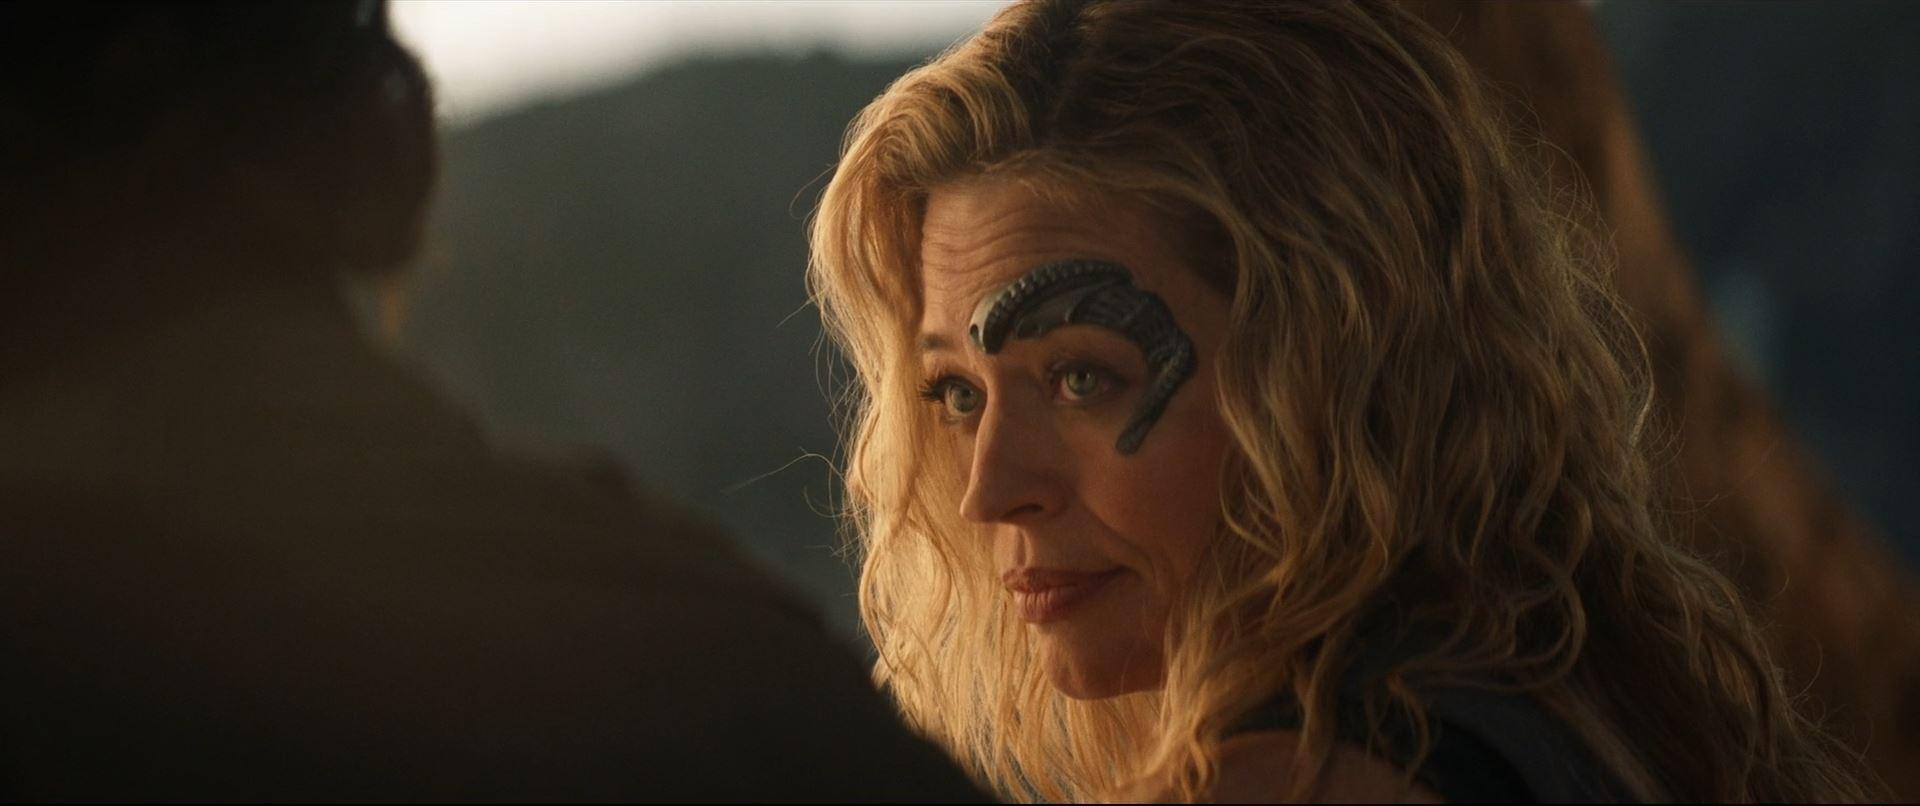 Star Trek Picard S01E10 Et in Arcadia Ego Part 2 Review - Jeri Ryan as Seven of Nine